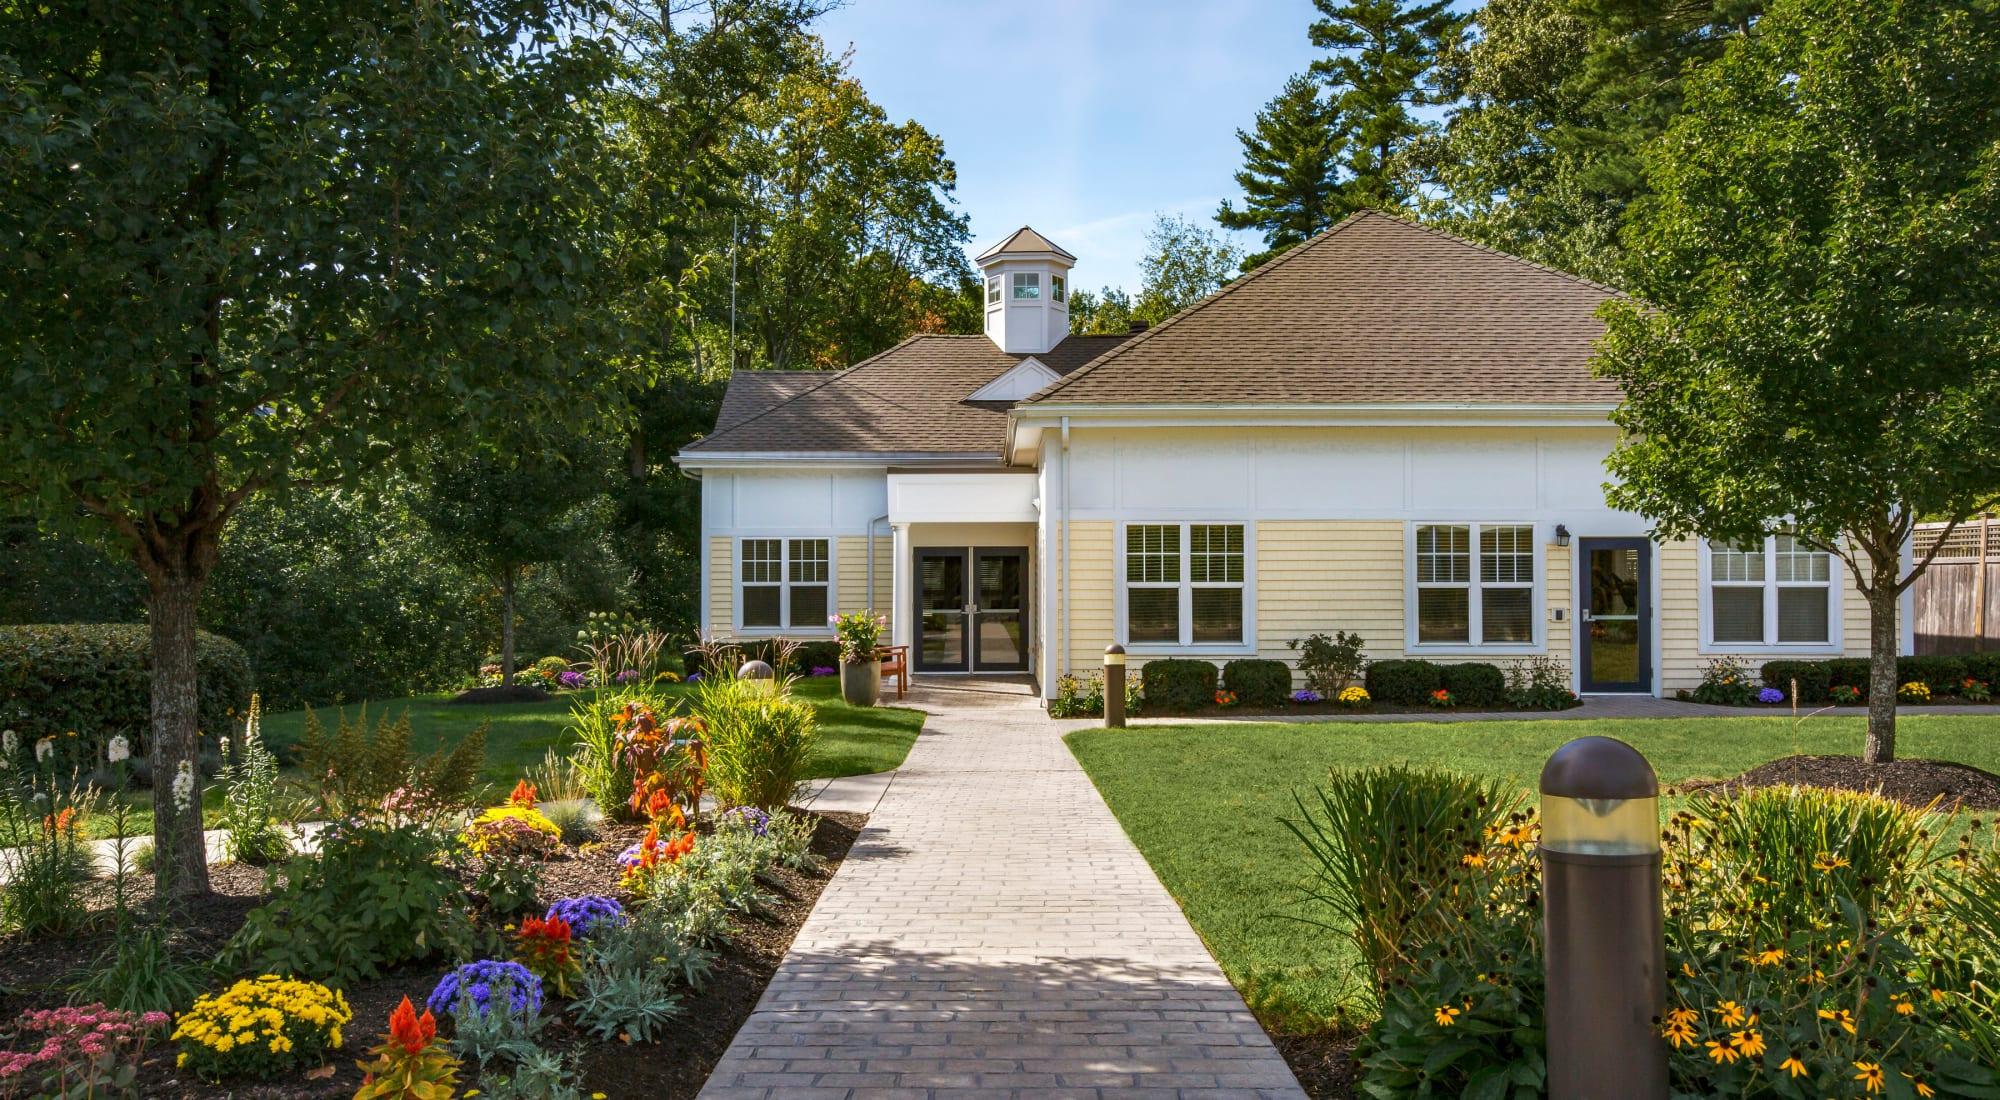 Schedule your tour of Regency Place in Wilmington, Massachusetts